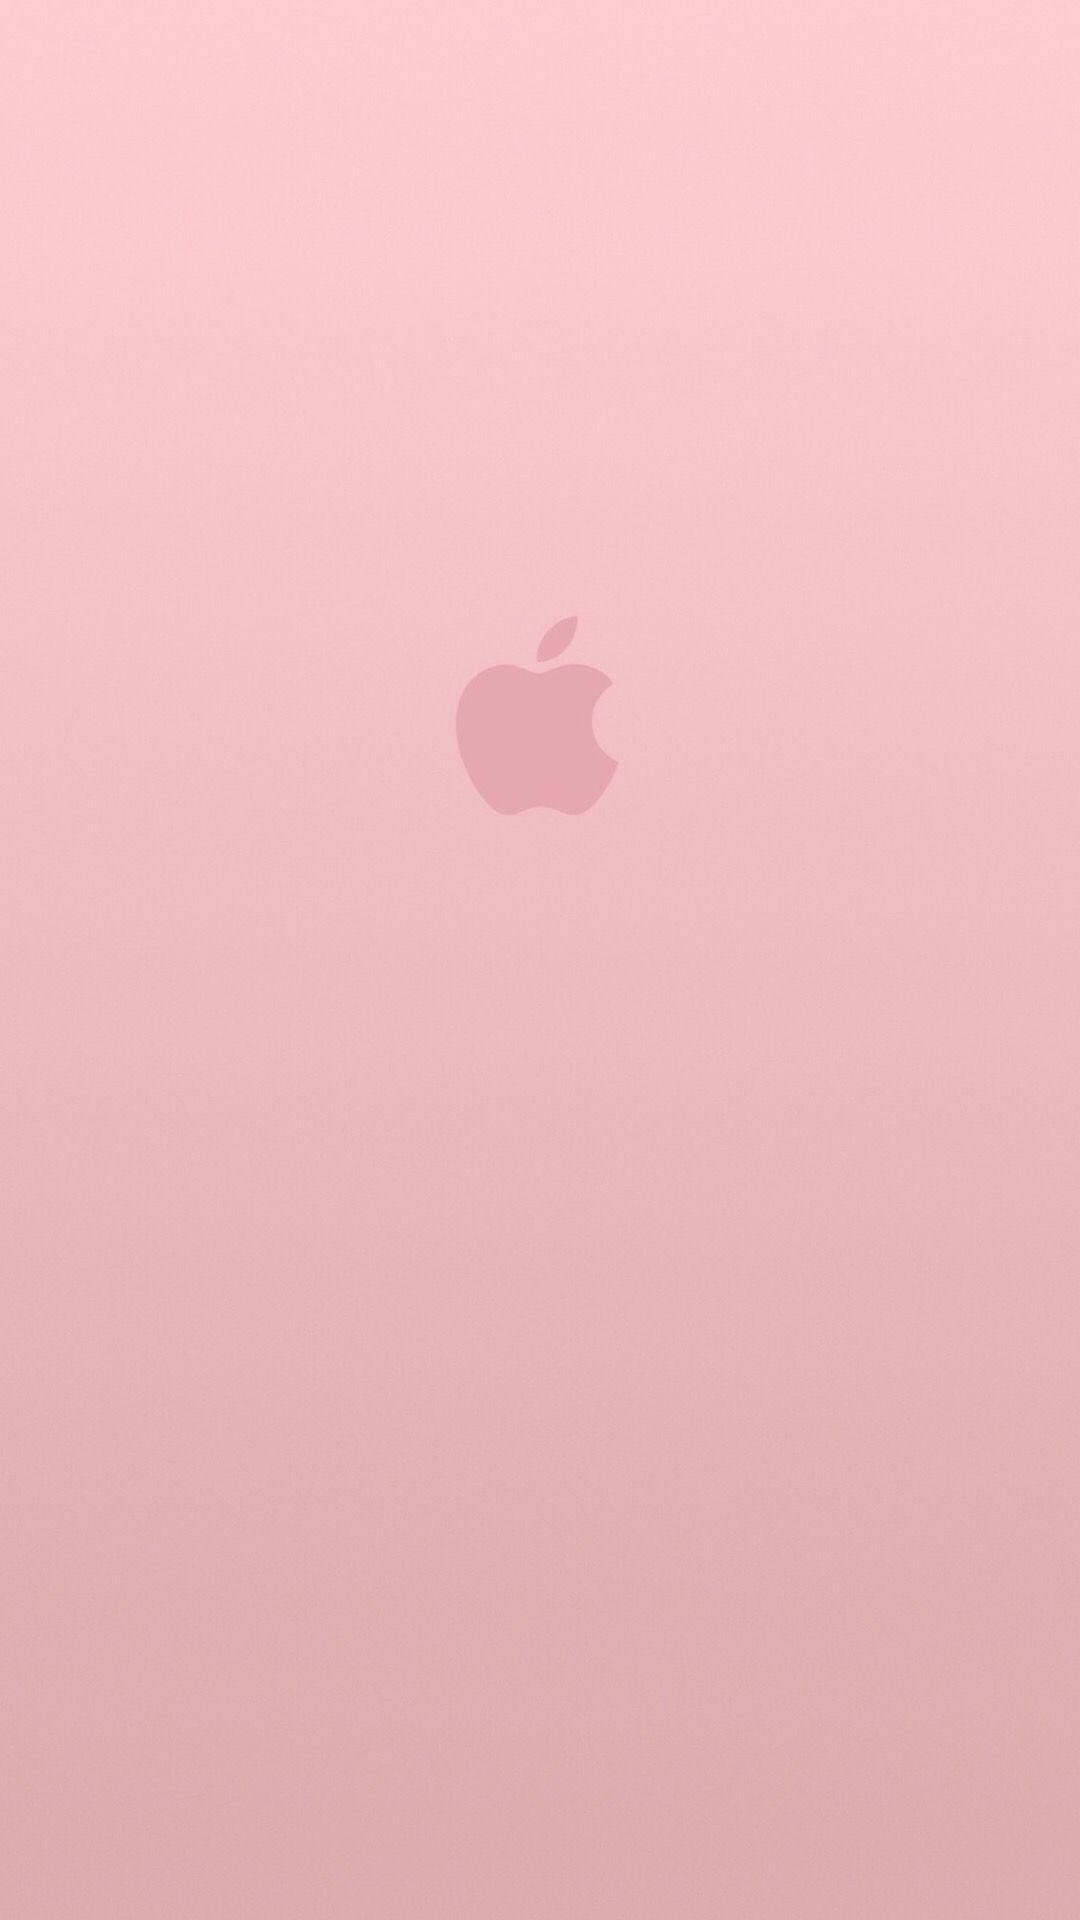 Pin By Vivi Varela On Wallparer Iphone Iphone Wallpaper Iphone Homescreen Wallpaper Pink Wallpaper Iphone